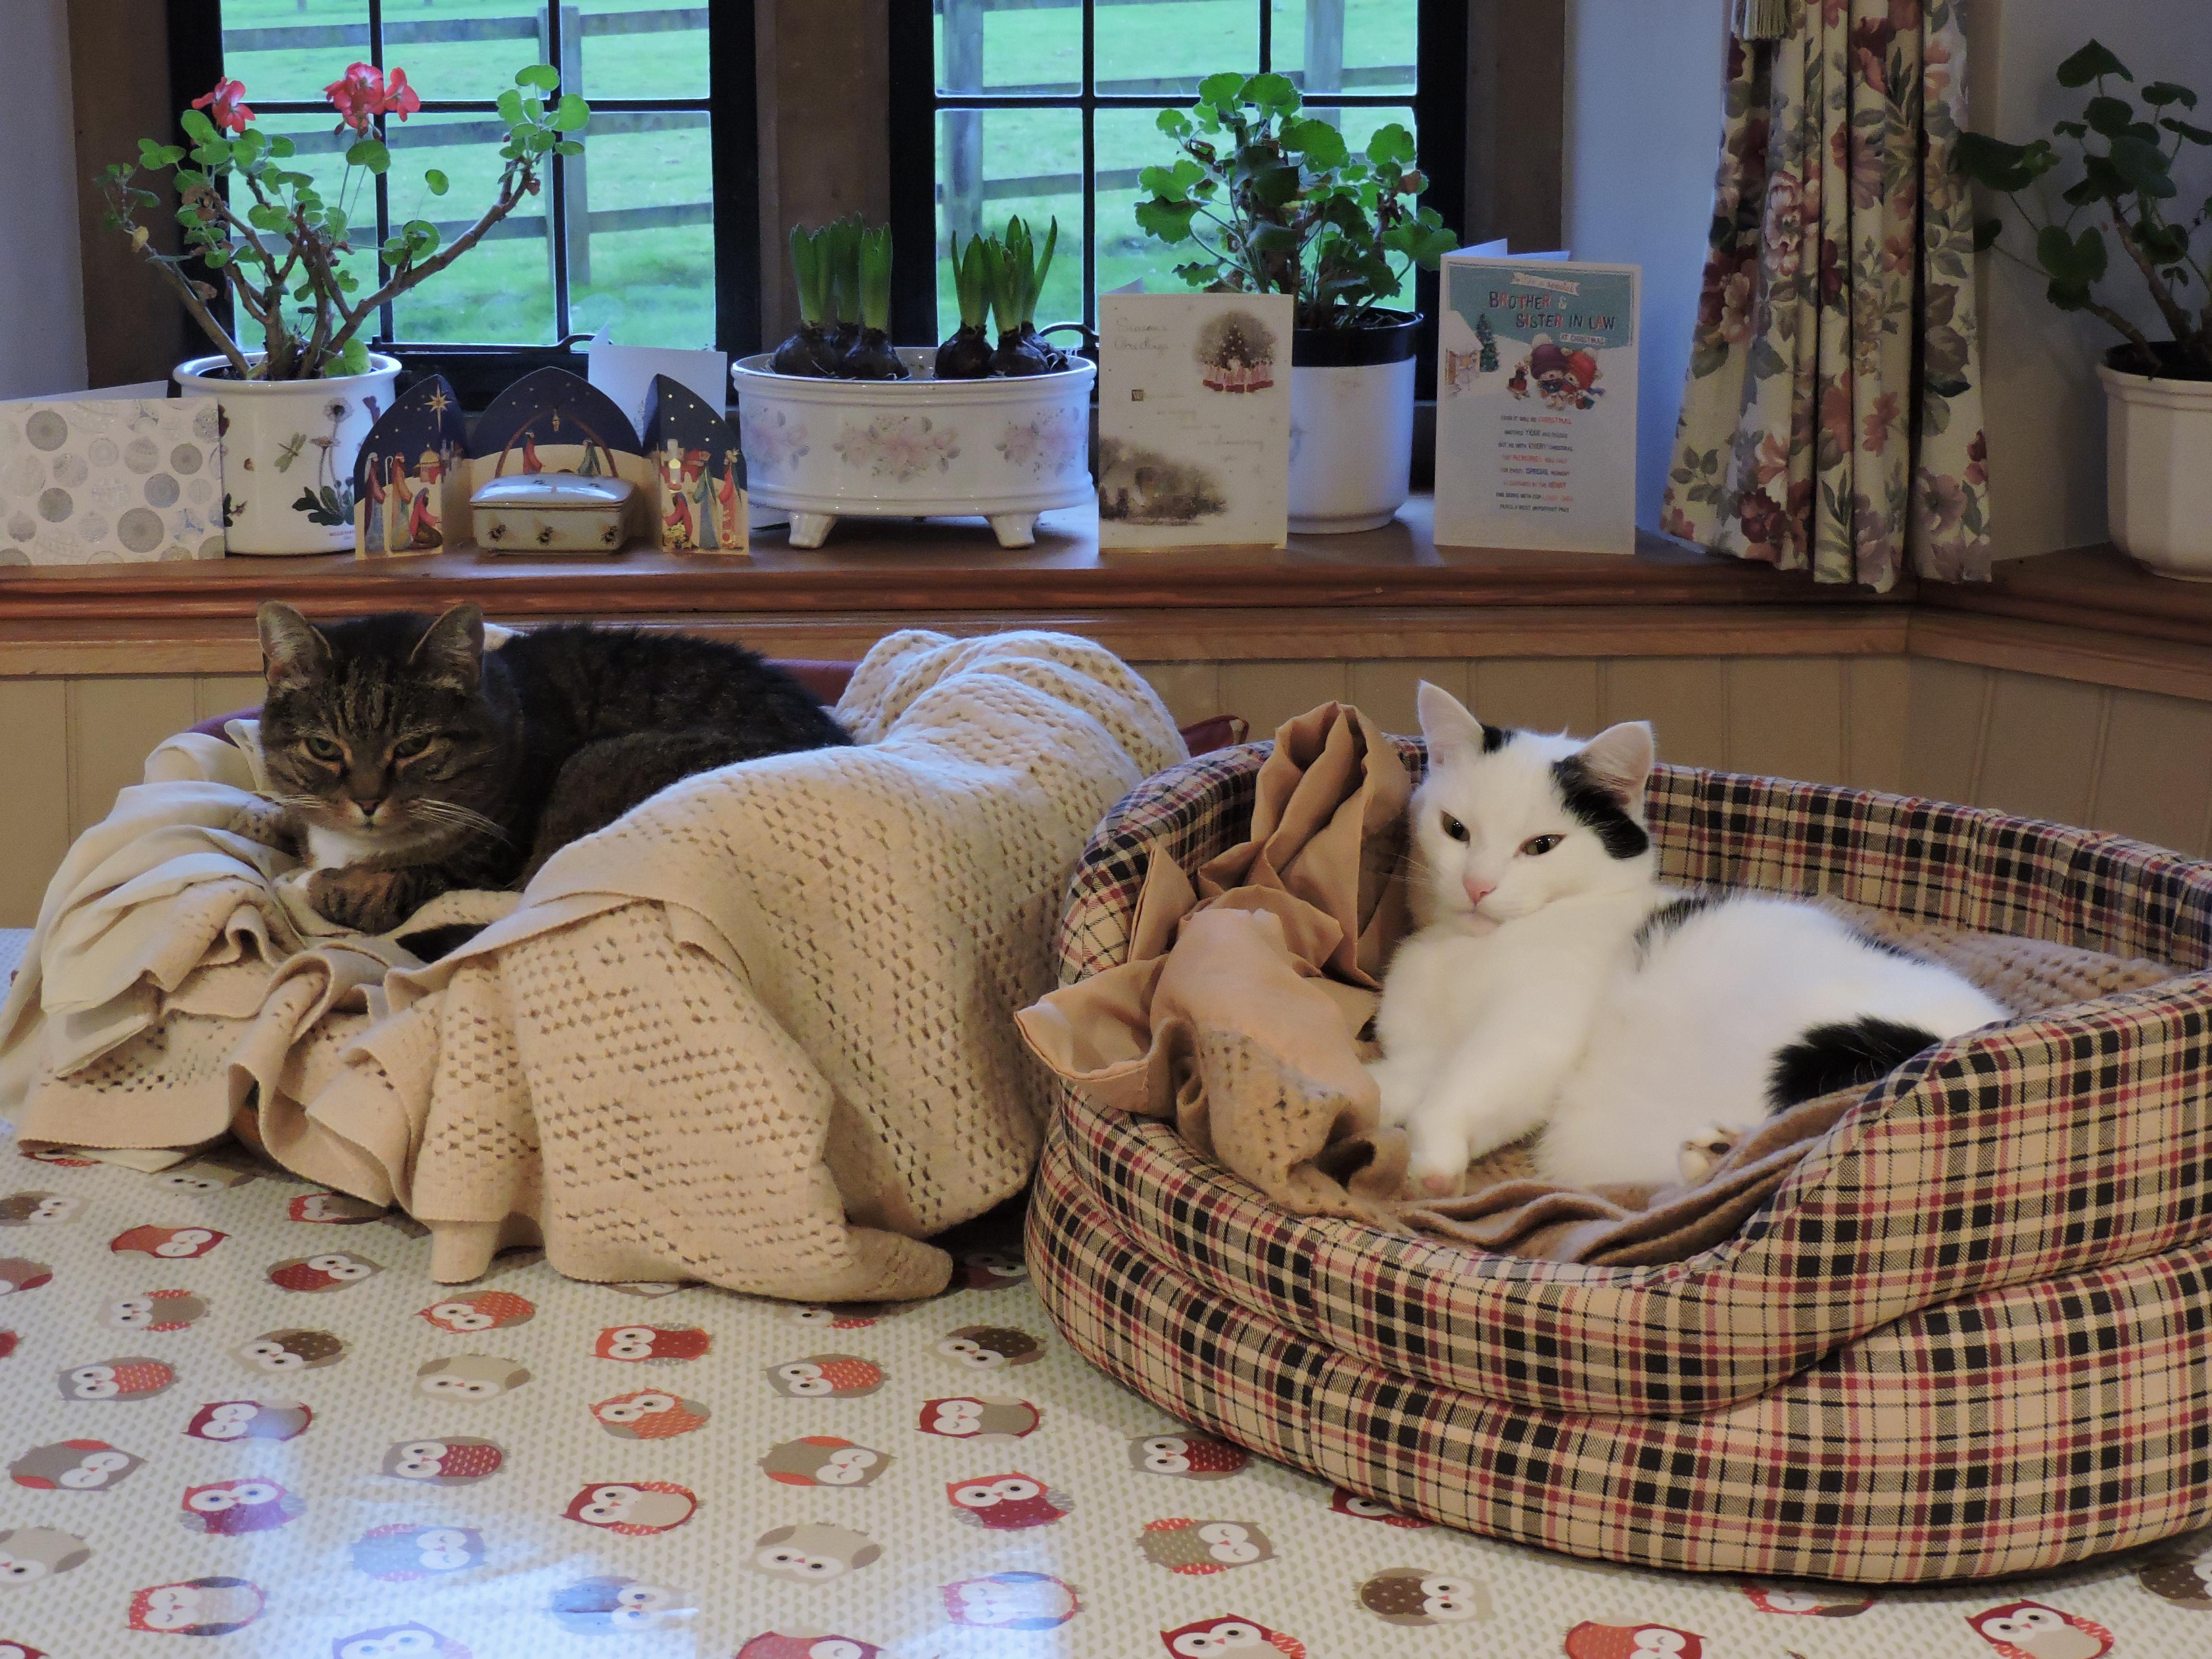 Spoilt cats